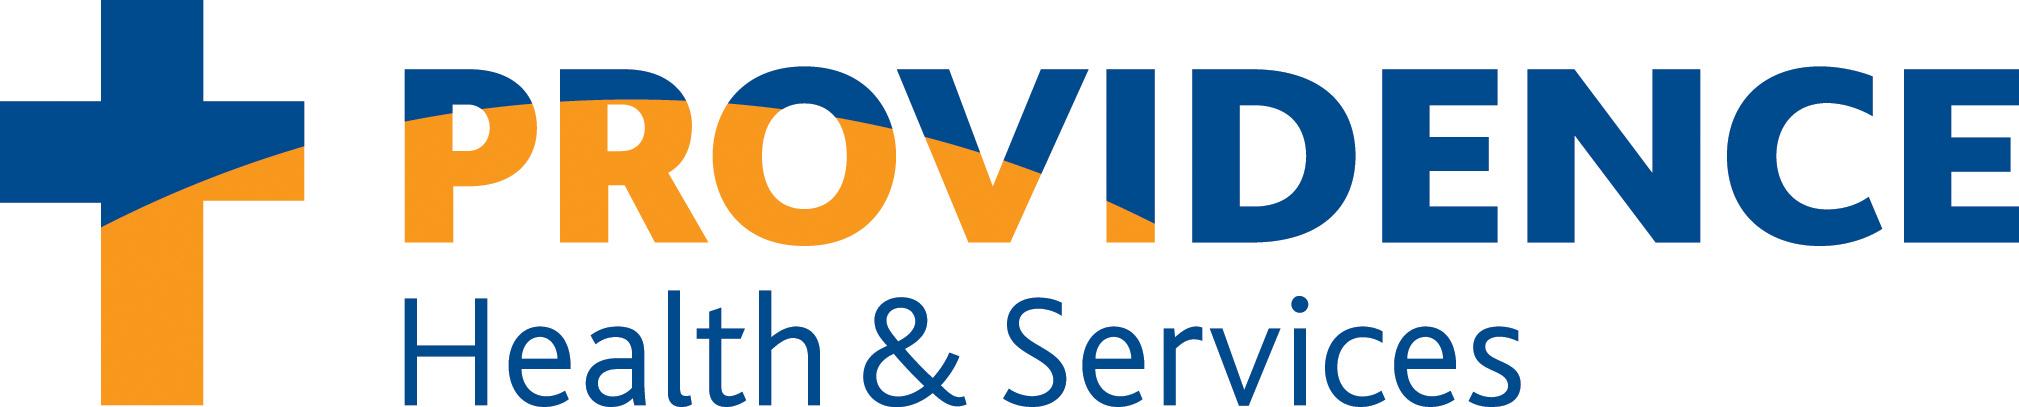 logo_ProvidenceHealth